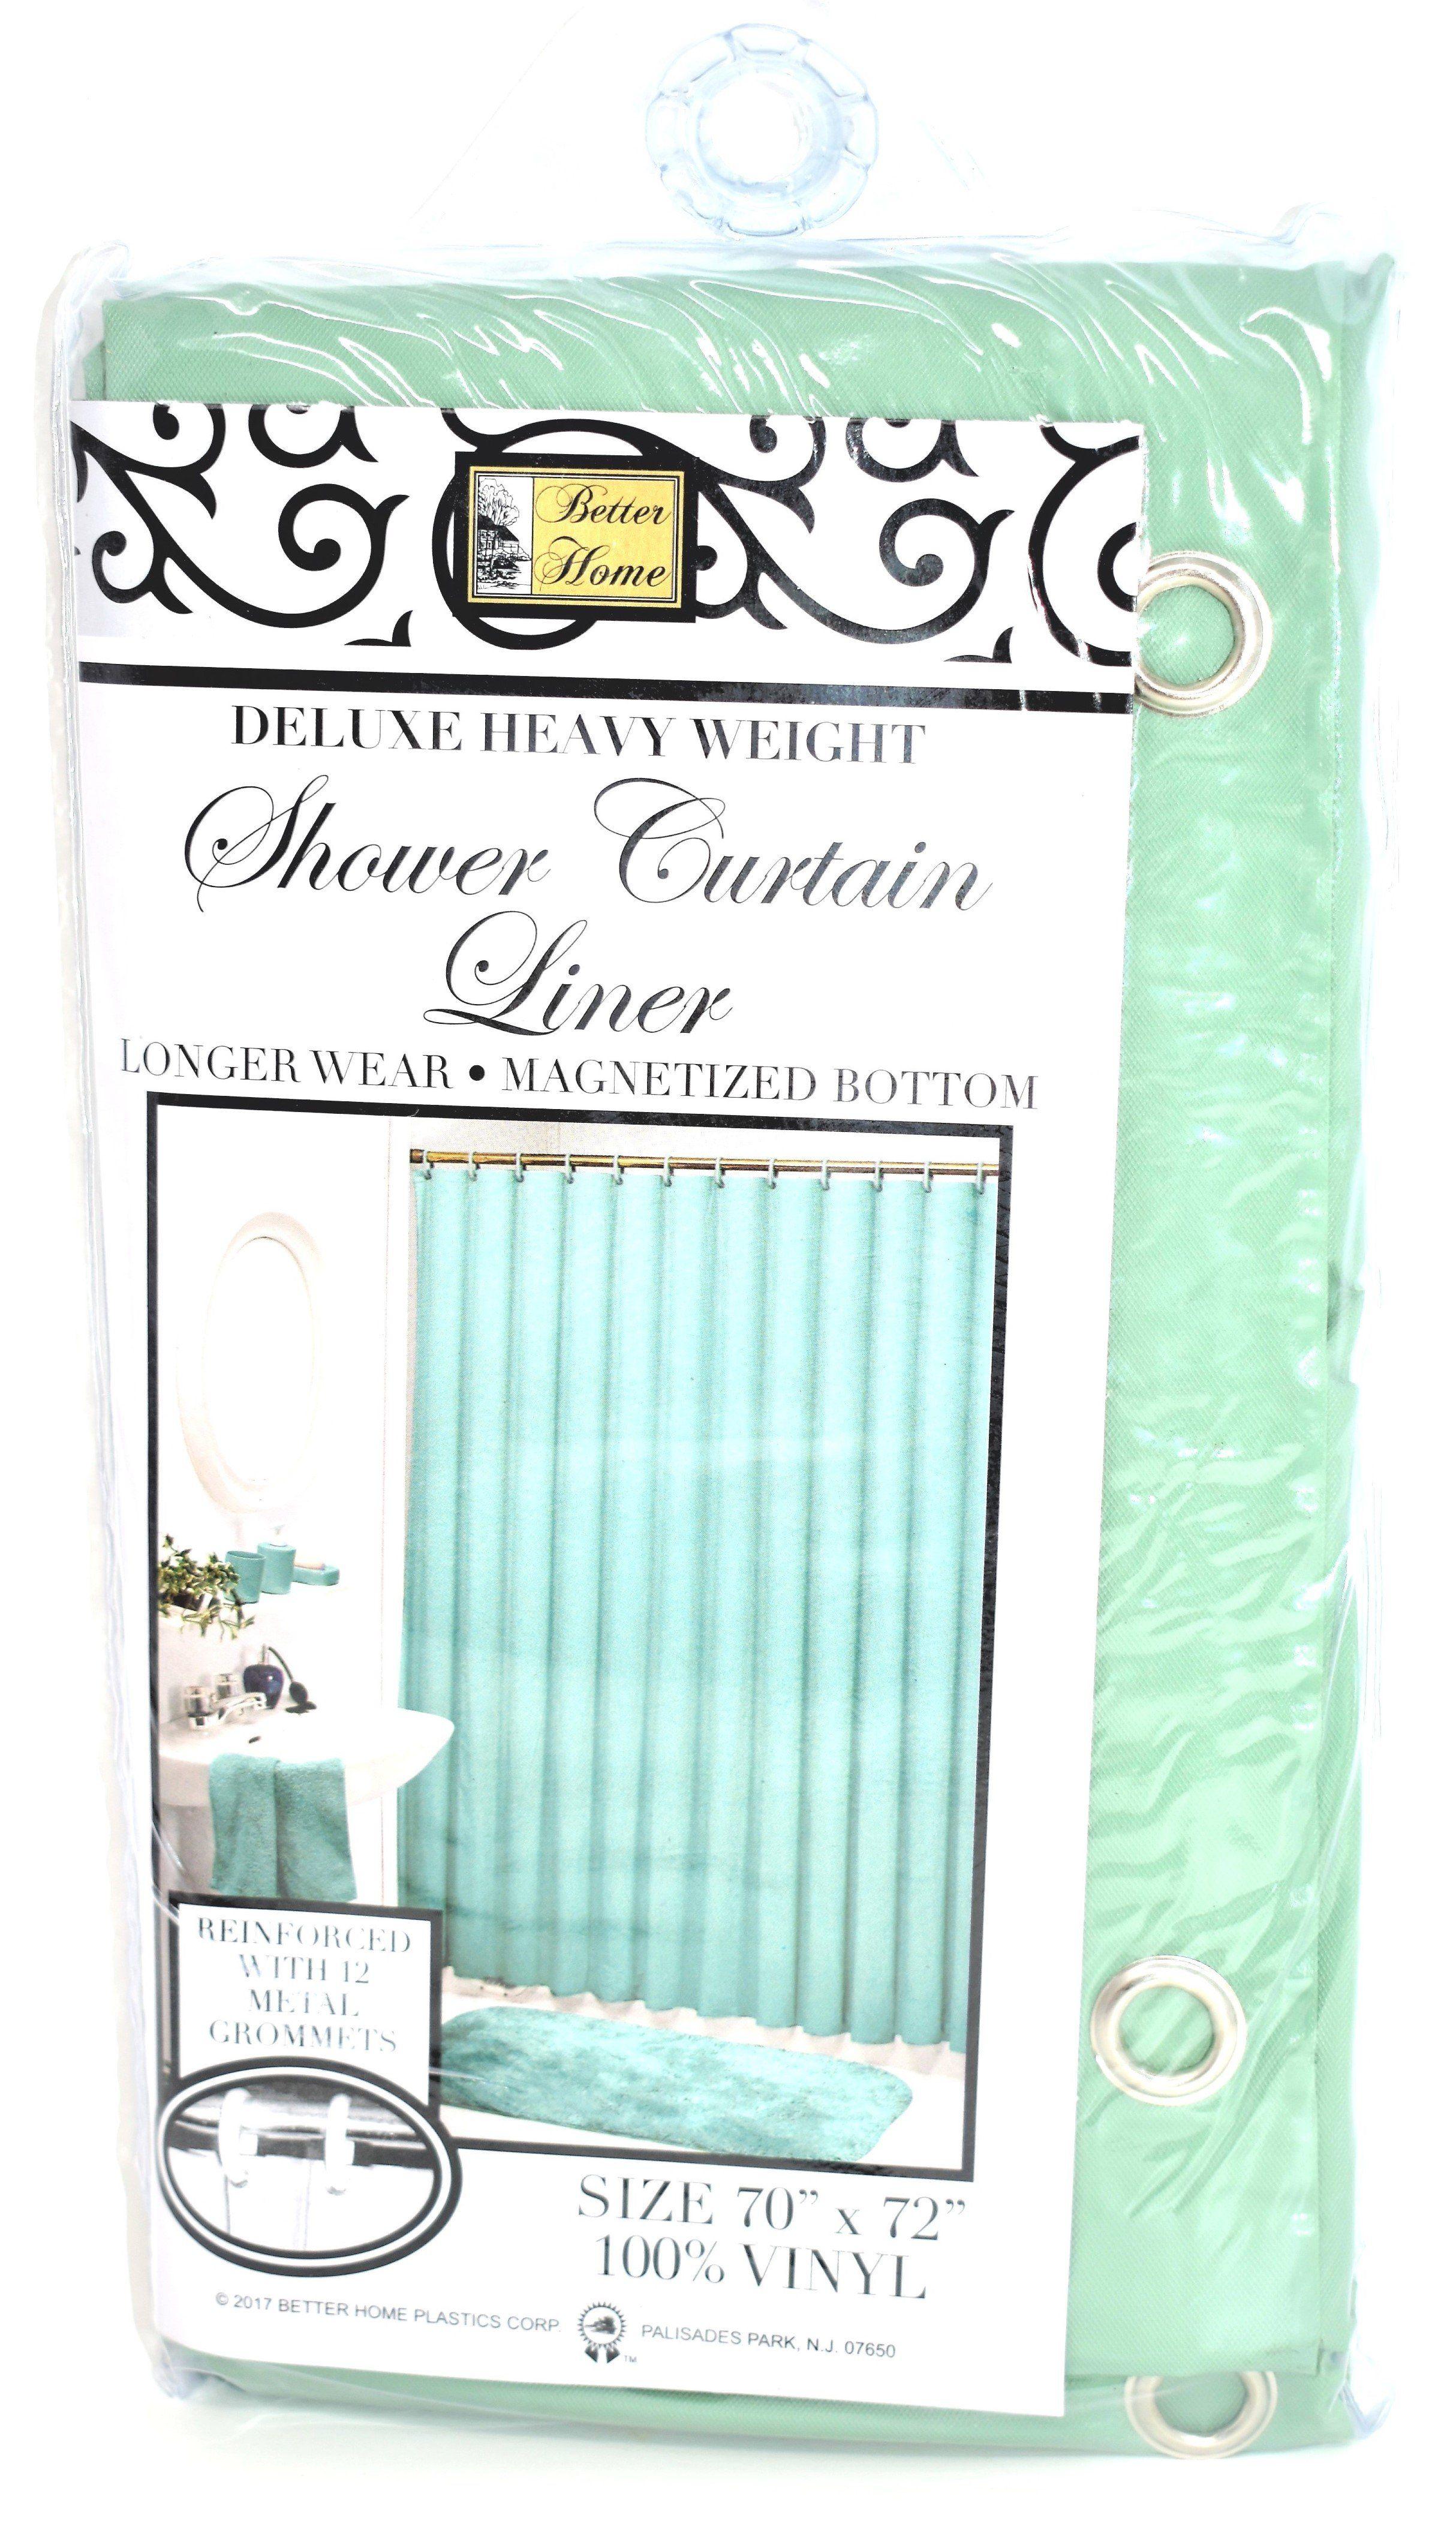 Deluxe Heavy Weight 100 Vinyl Shower Curtain Liner 70 X 72 Sage Color Vinyl Shower Curtains Sage Color Curtains